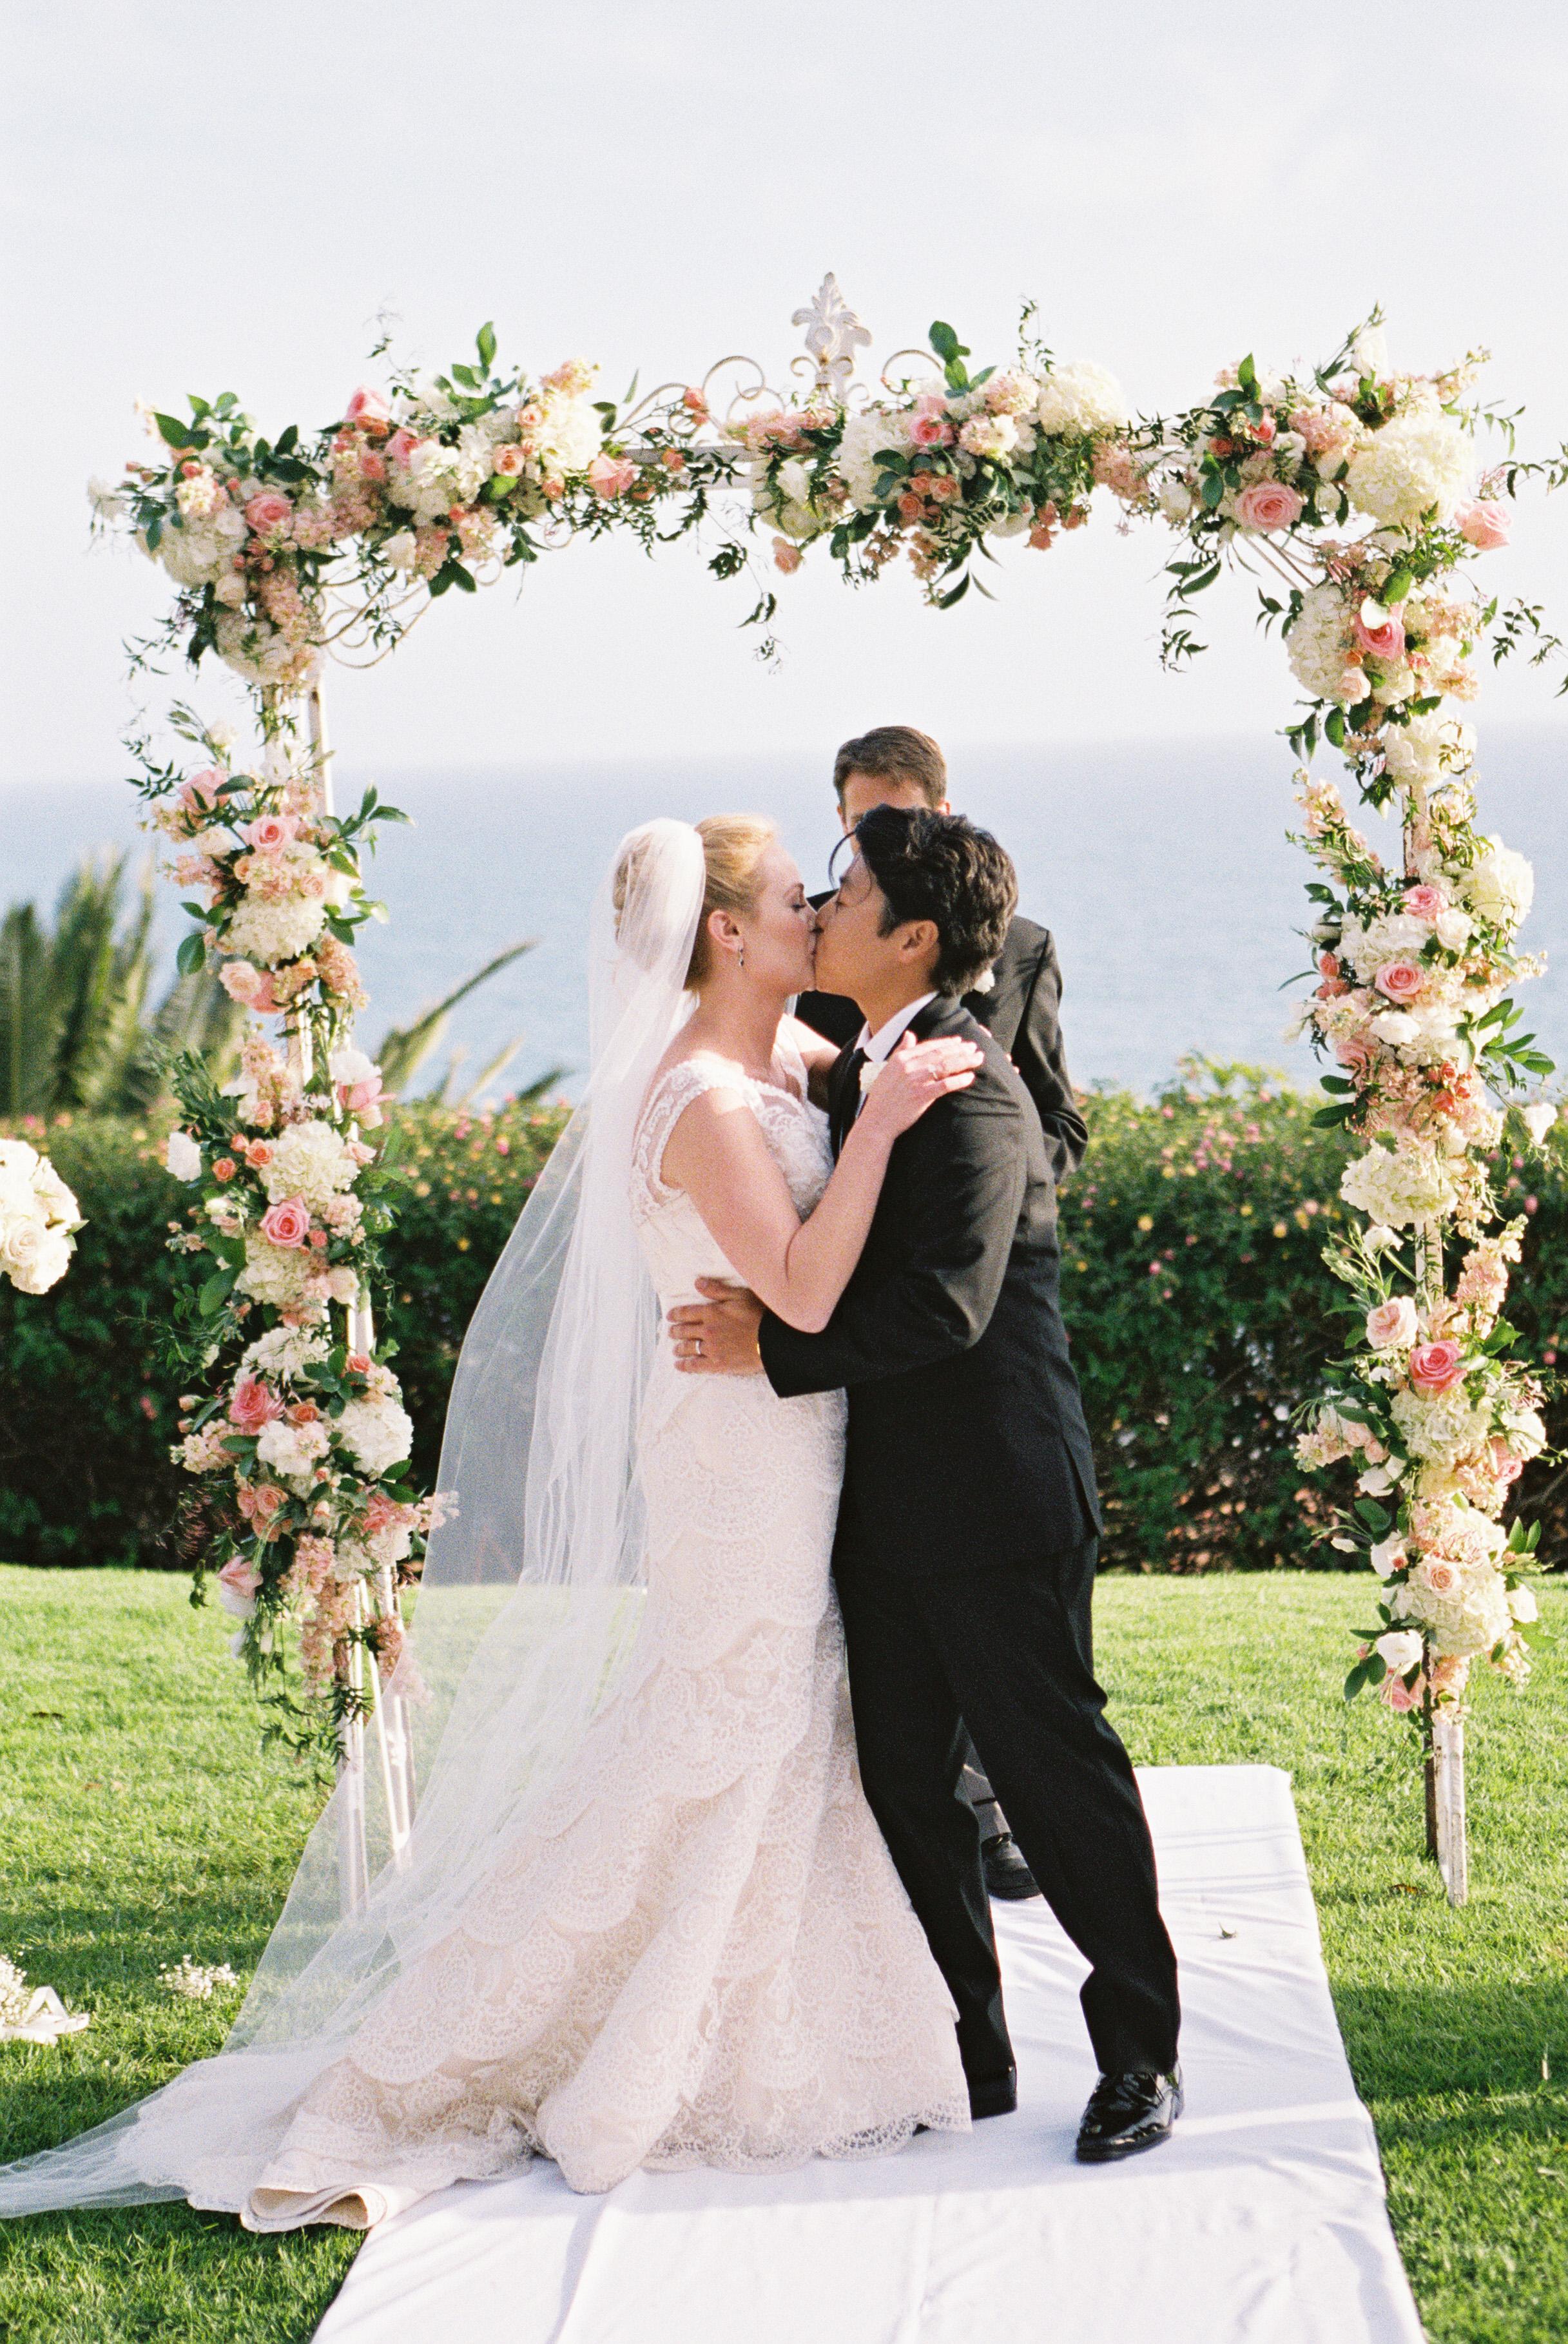 Wedding Arch With Flowers Elizabeth Anne Designs The